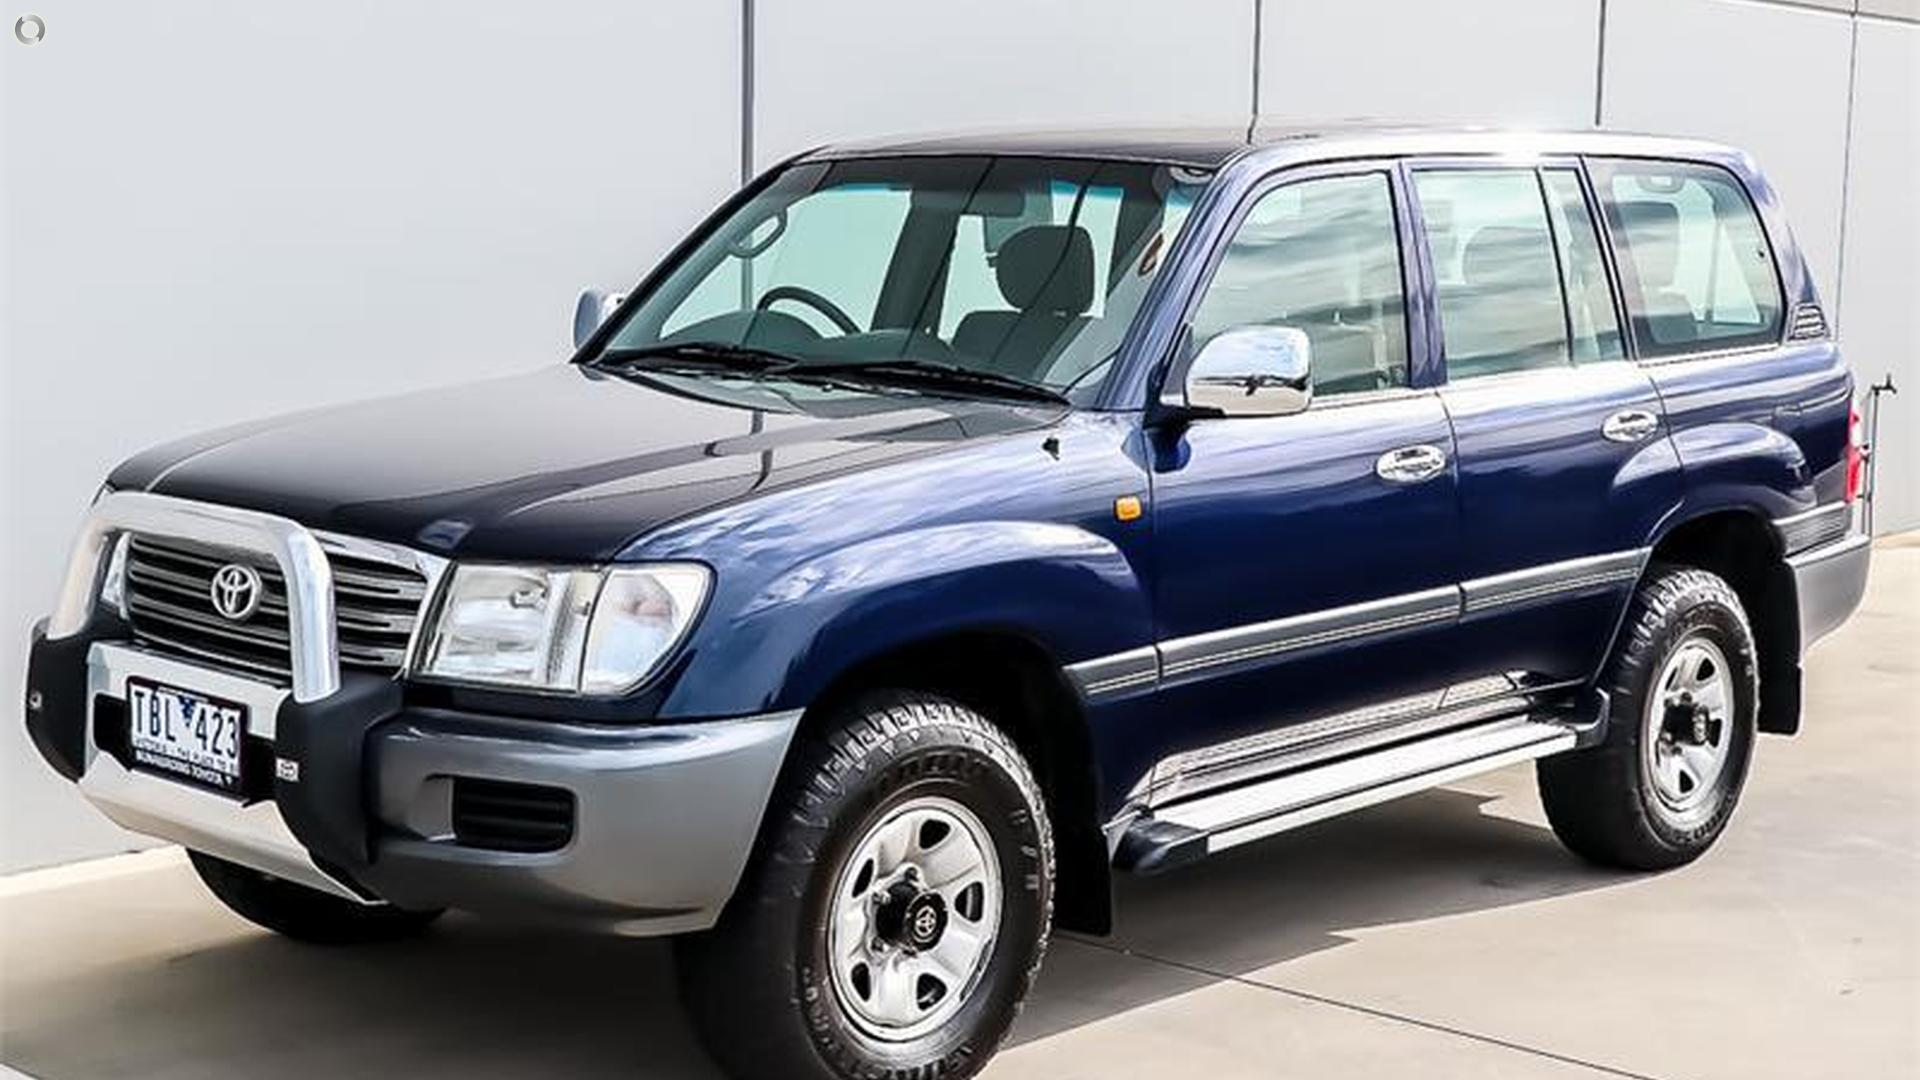 2003 Toyota Landcruiser UZJ100R